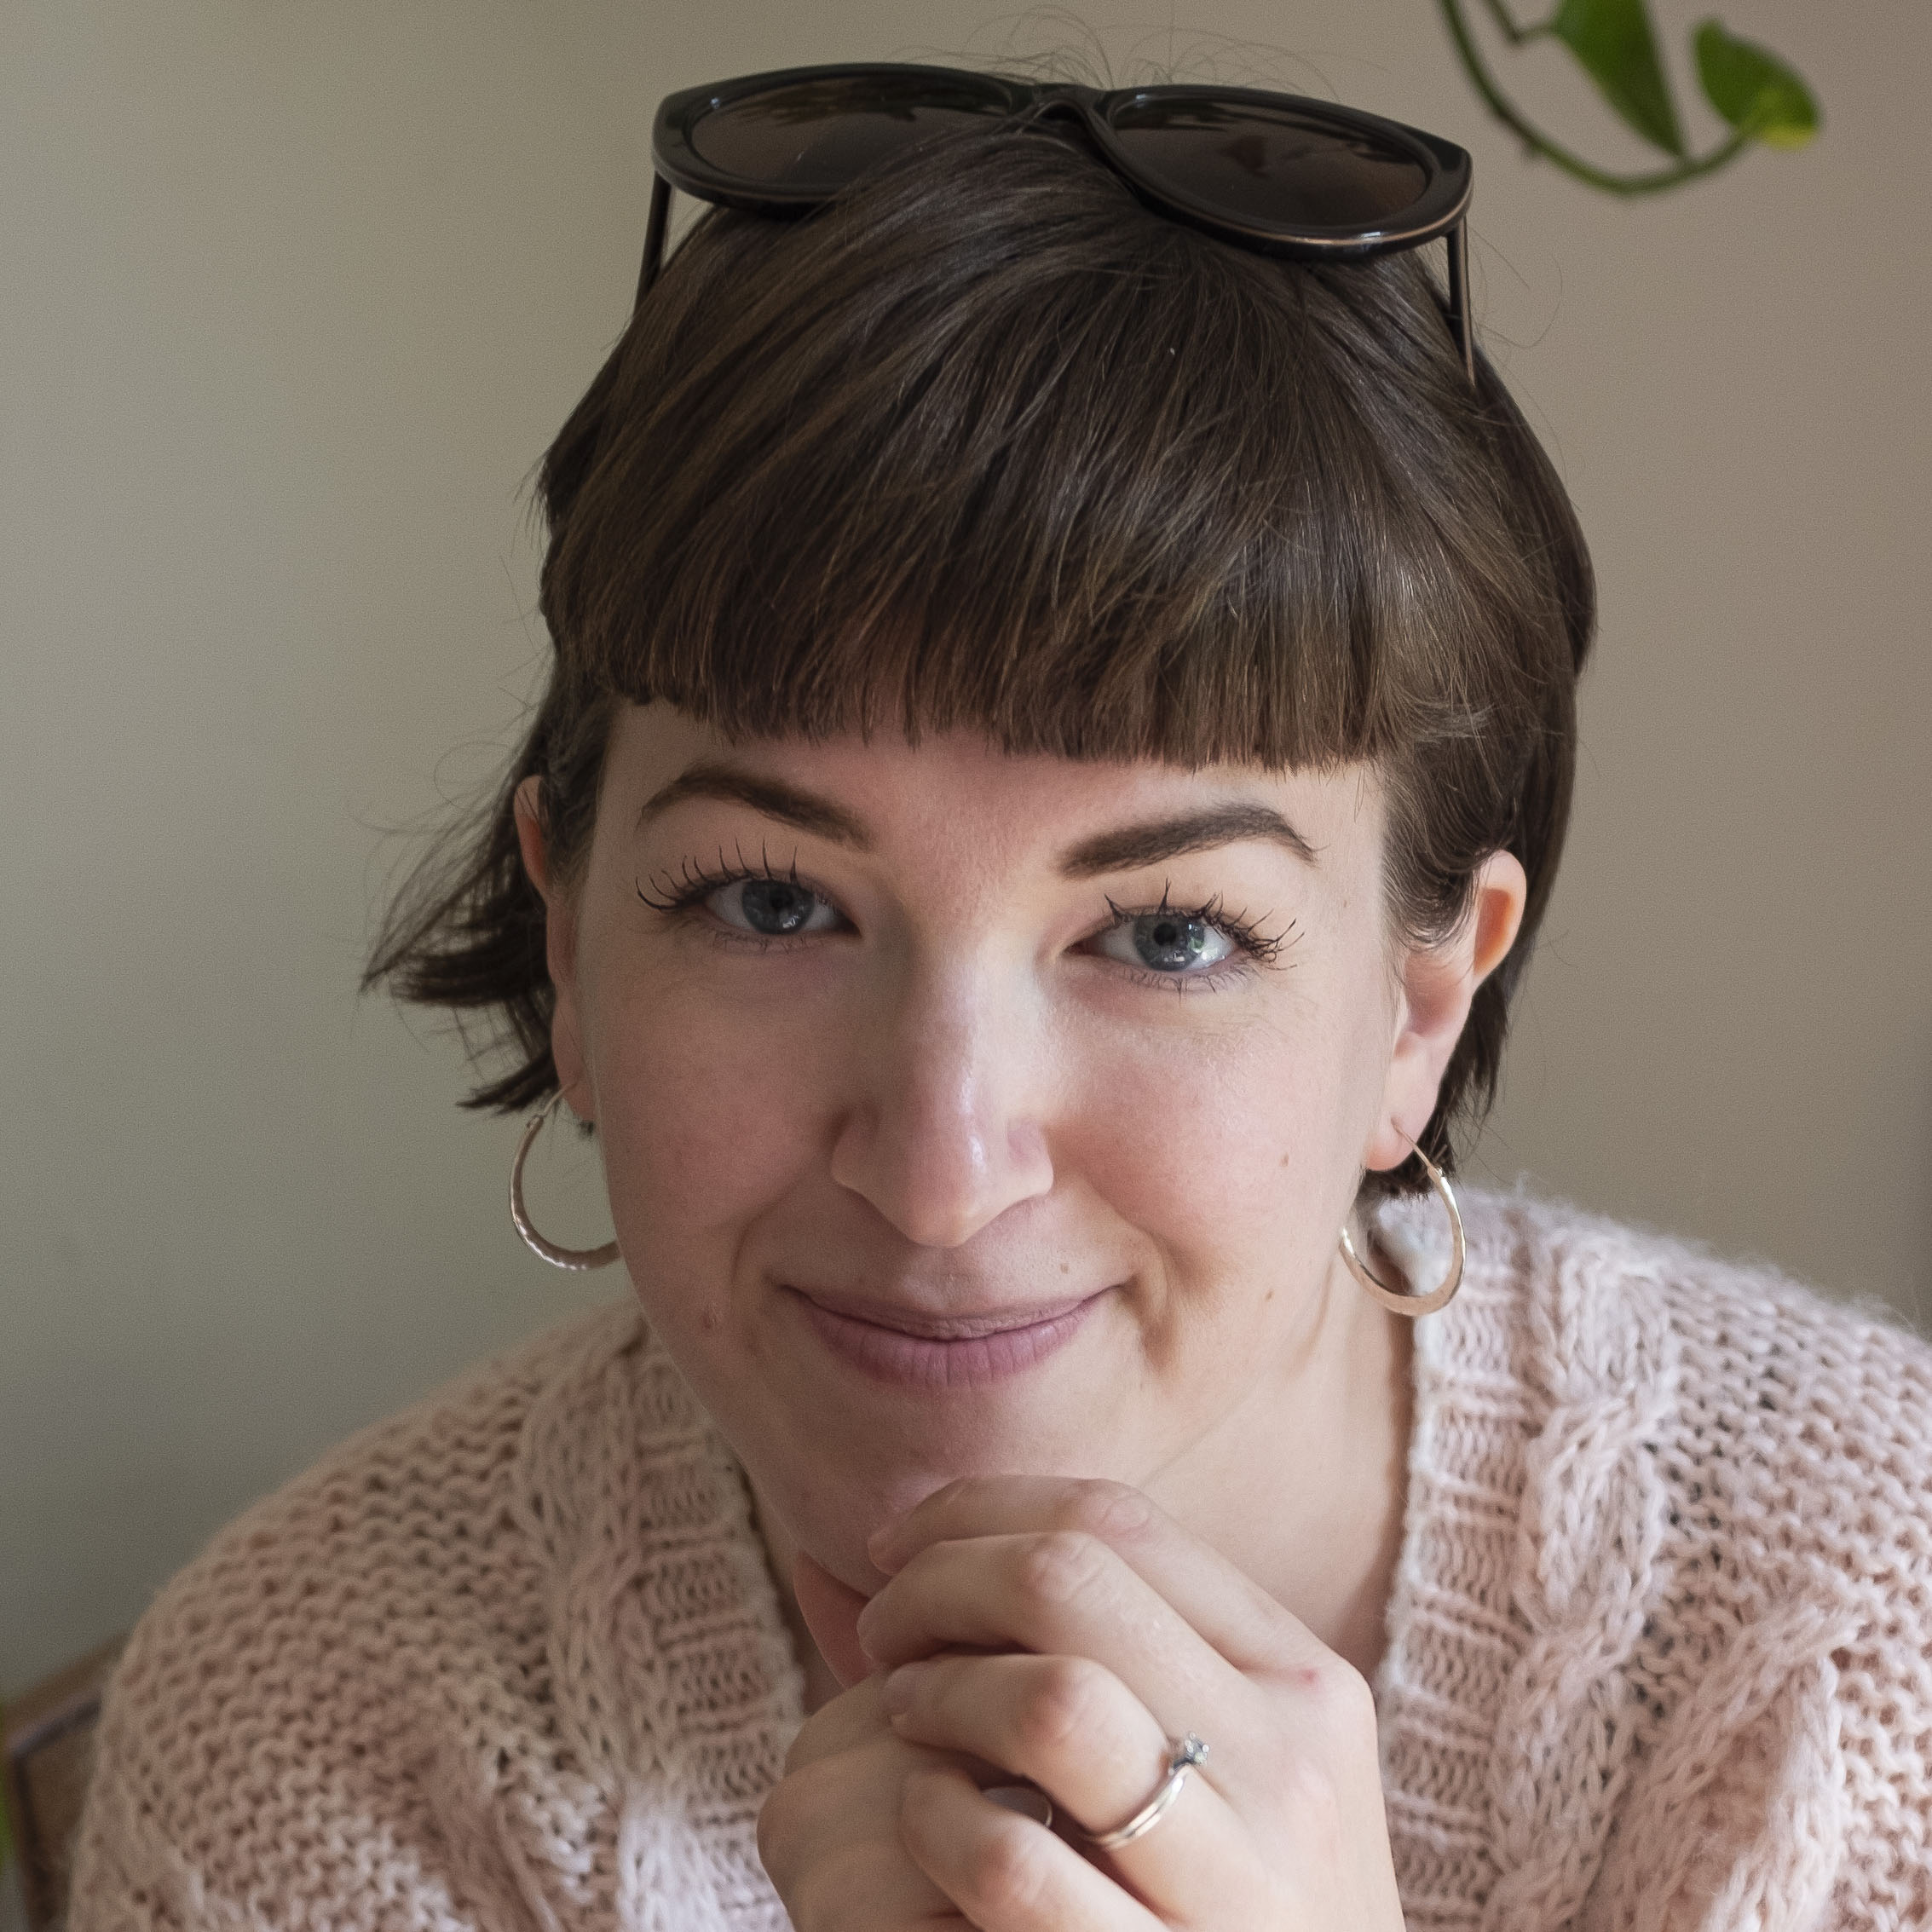 Ellie Shipman – Participatory Artist and Illustrator